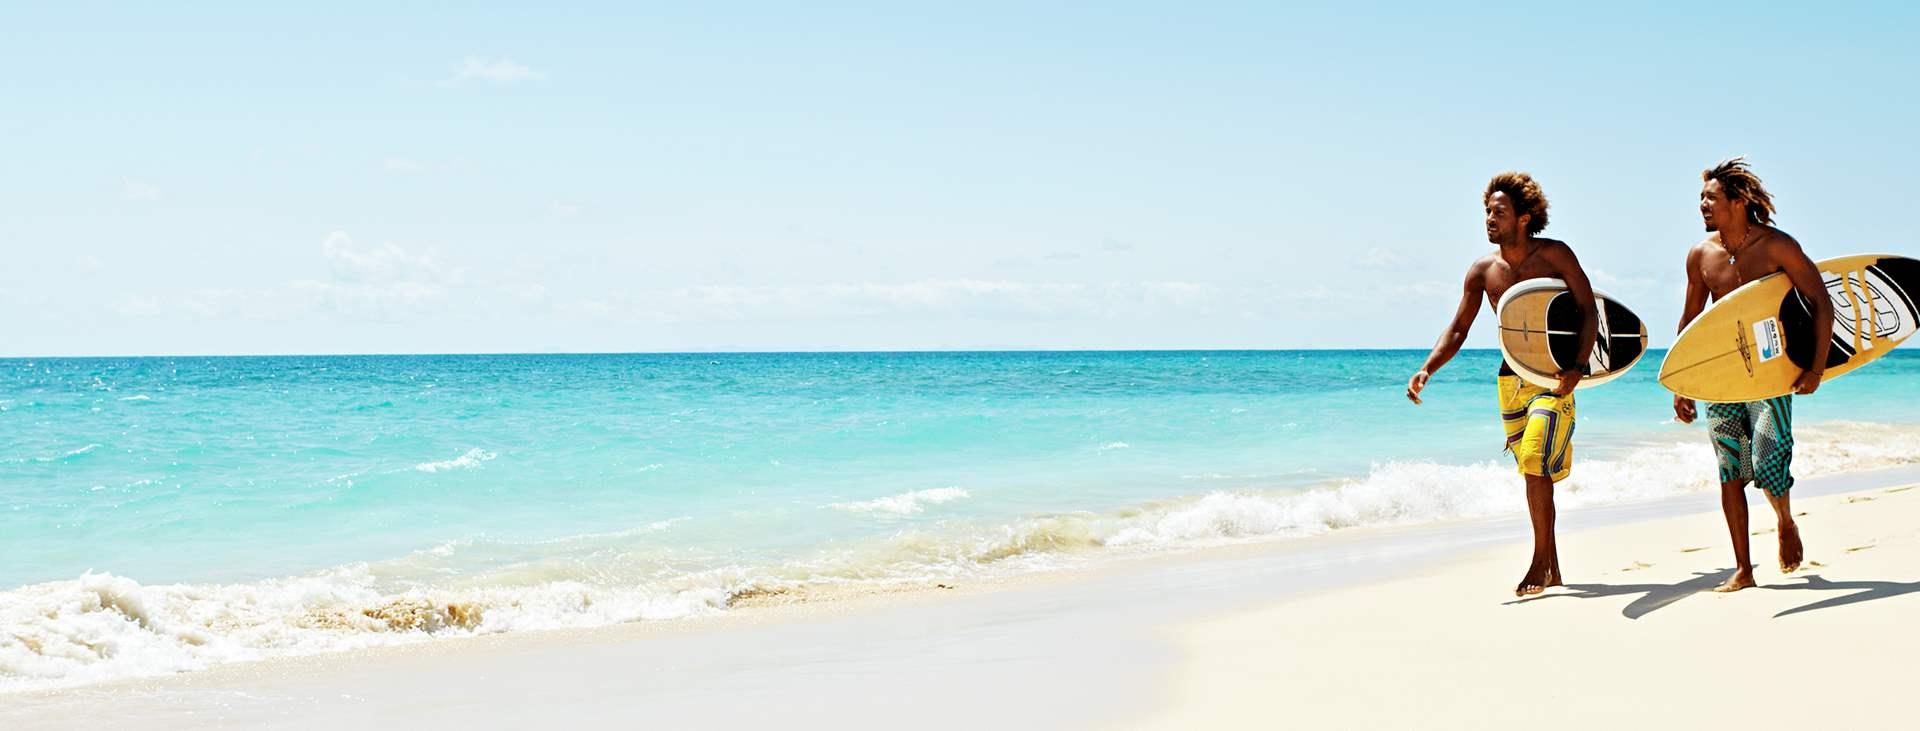 Boka din resa till Sal, Kap Verde med Ving